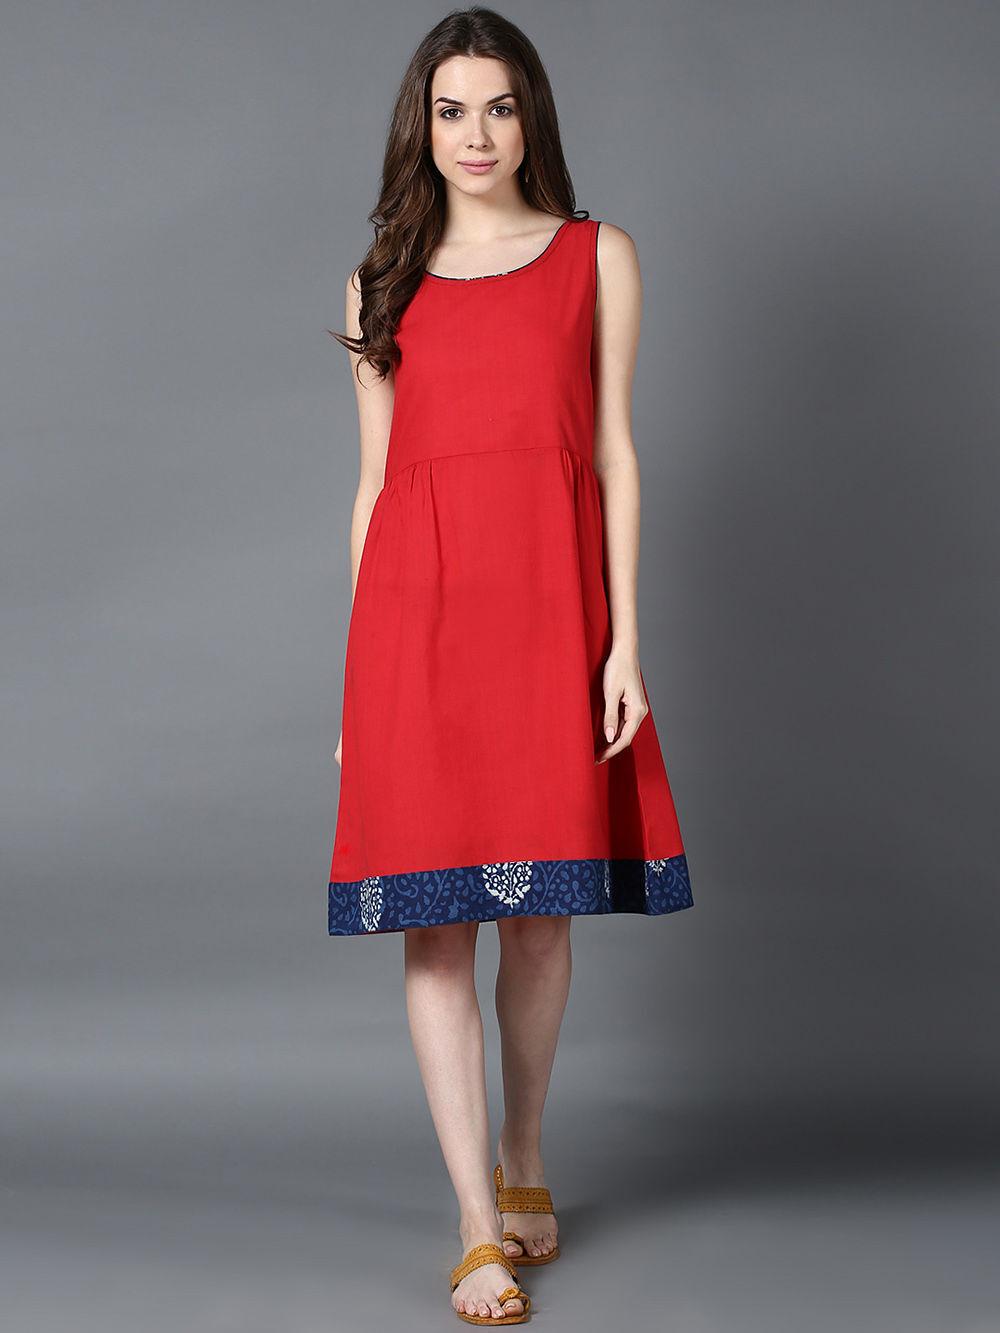 Red Dress Online